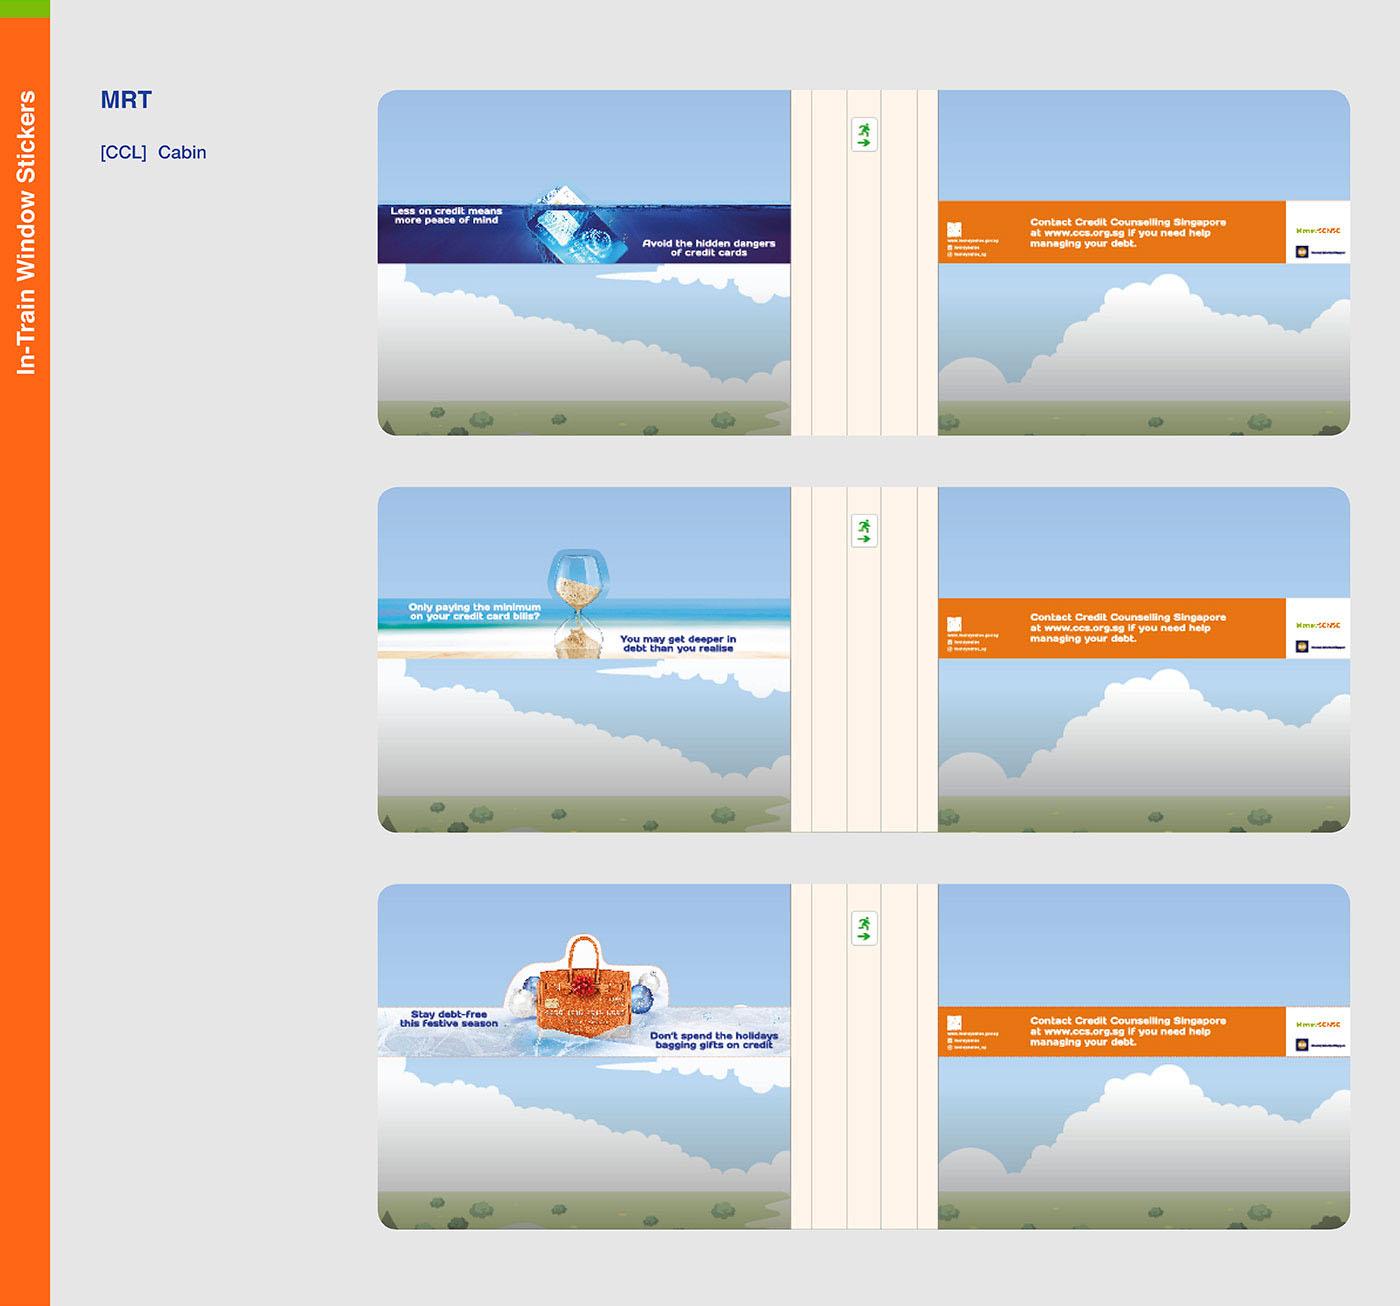 money moneysense mas singapore credit card loans Government Tip Of Iceberg metaphor finance